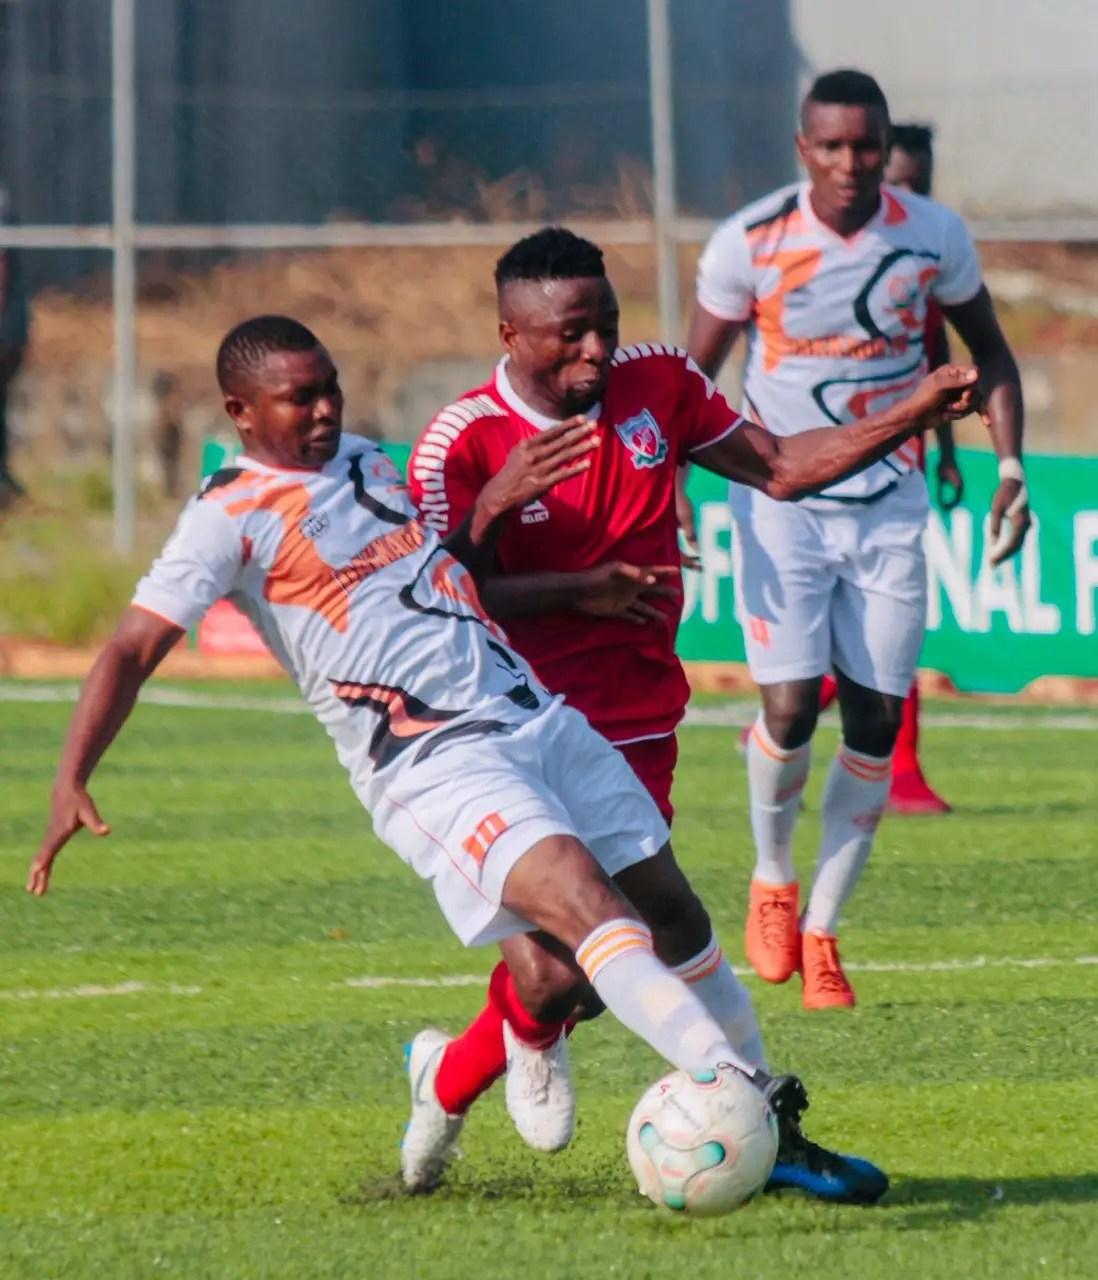 NPFL: Plateau United Maintain Unbeaten Streak, Sunshine Pip Akwa United In Akure